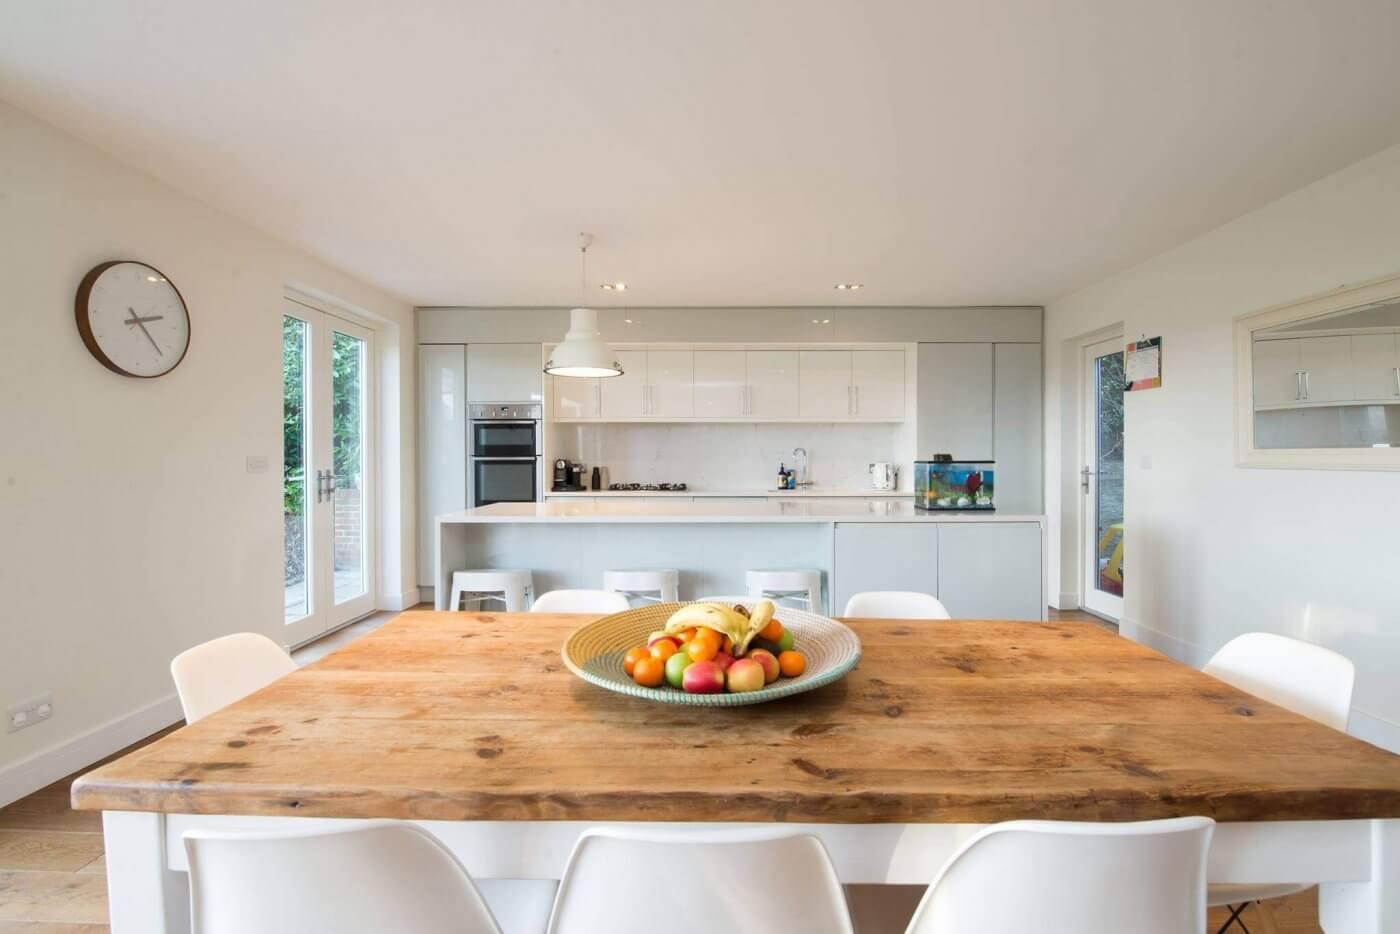 Minimalistic Kitchen | The Mustcard